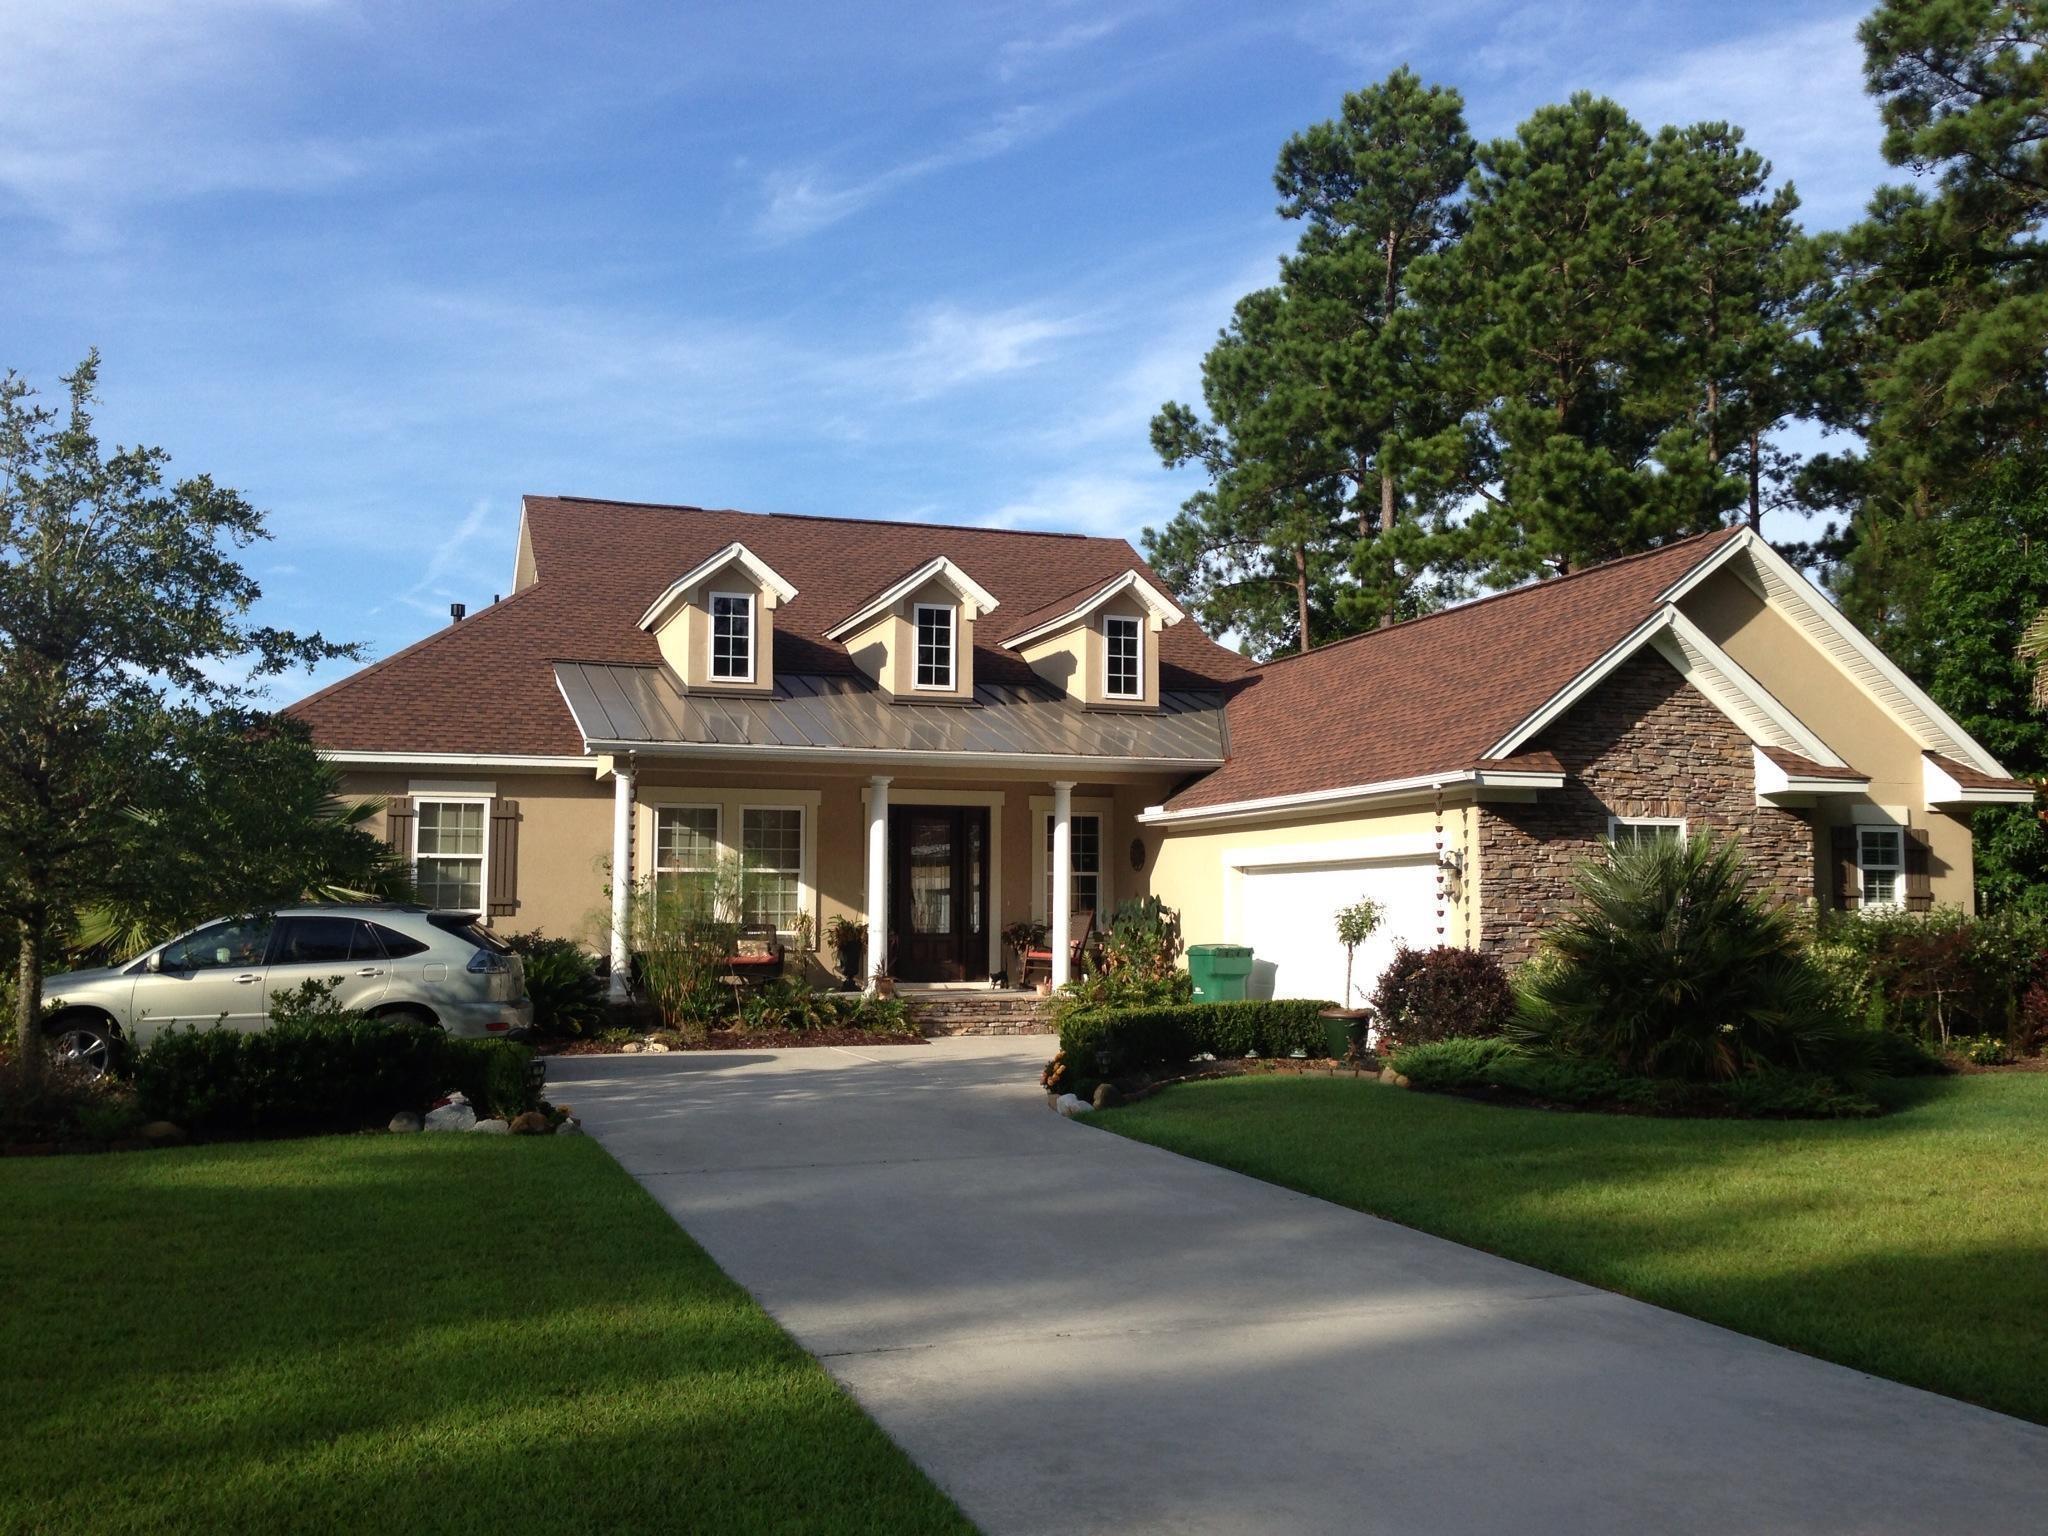 RoofCrafters-Savannah image 80